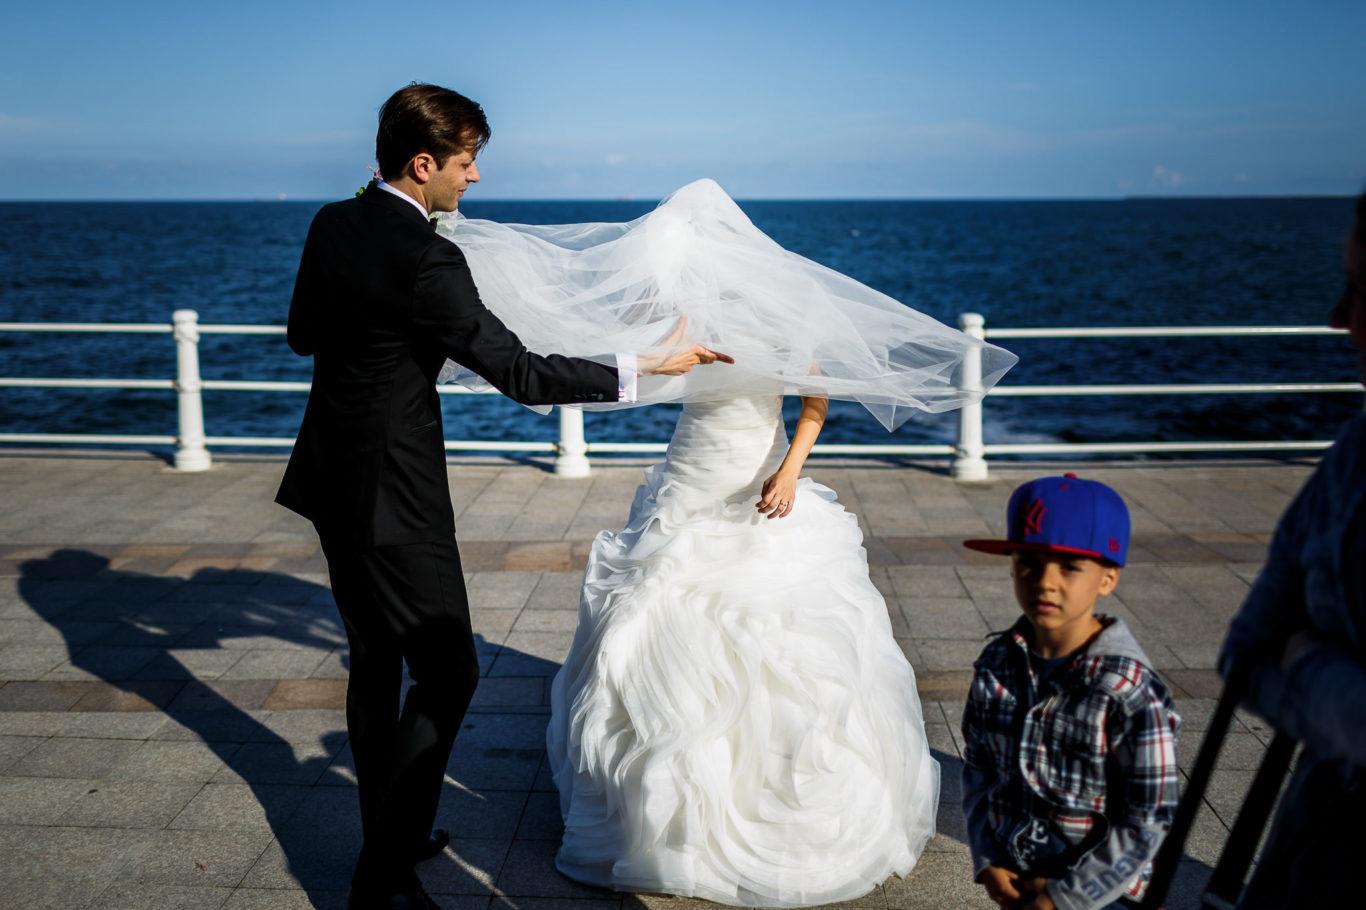 0659-Fotografie-nunta-Simona-Valentin-fotograf-Ciprian-Dumitrescu-CDF_0058 (3)